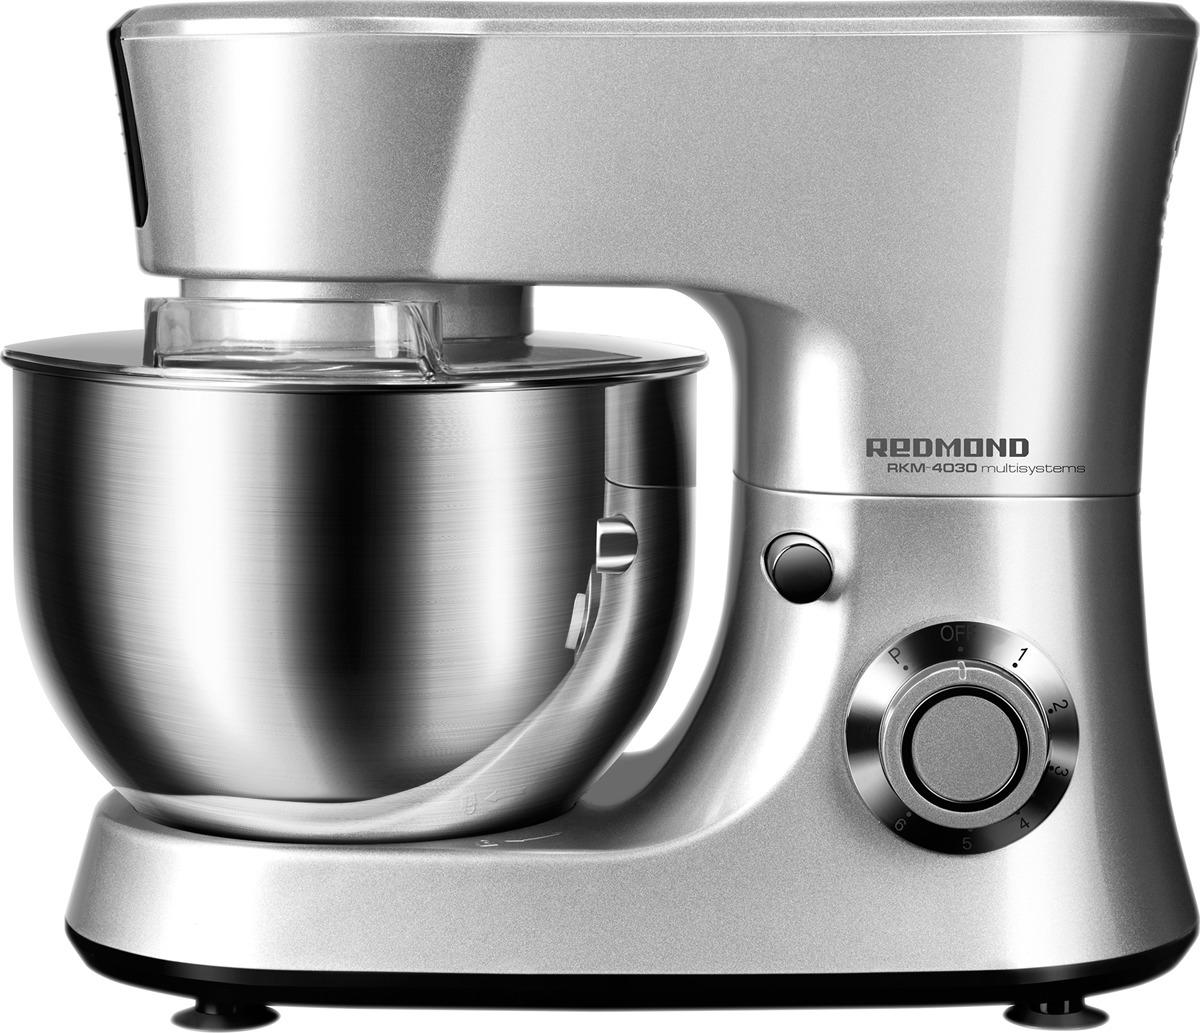 Кухонный комбайн Redmond RKM-4030, серый металлик